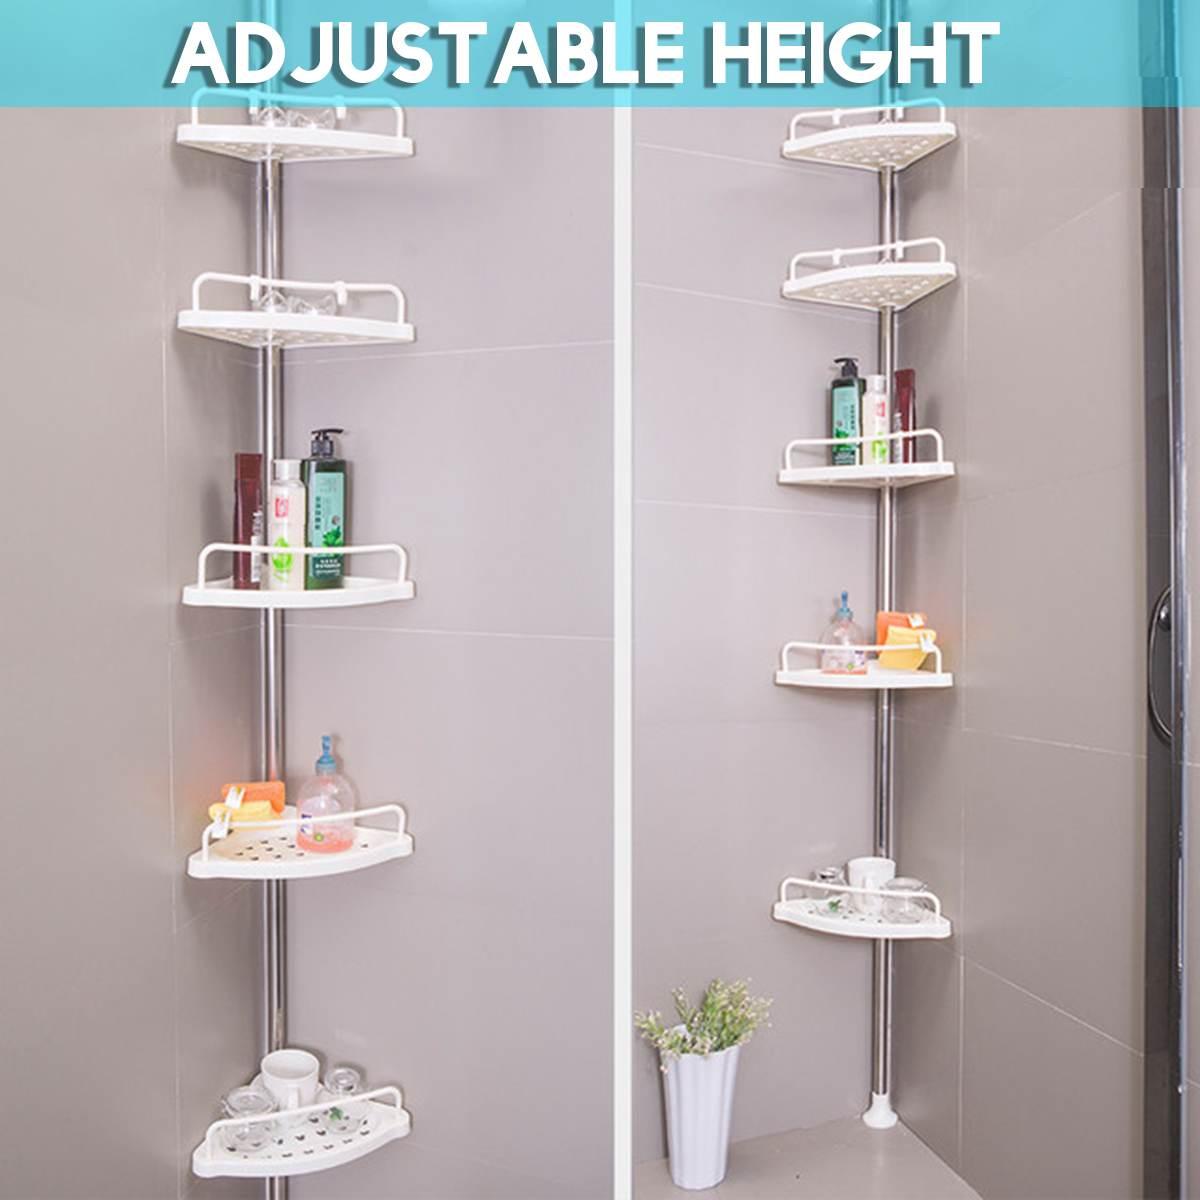 1Set Stainless Steel 5 Tier Telescopic Bathroom Corner Shelf Rack Shower Caddy Storage Bathroom Shelves Space Saving Bath Access